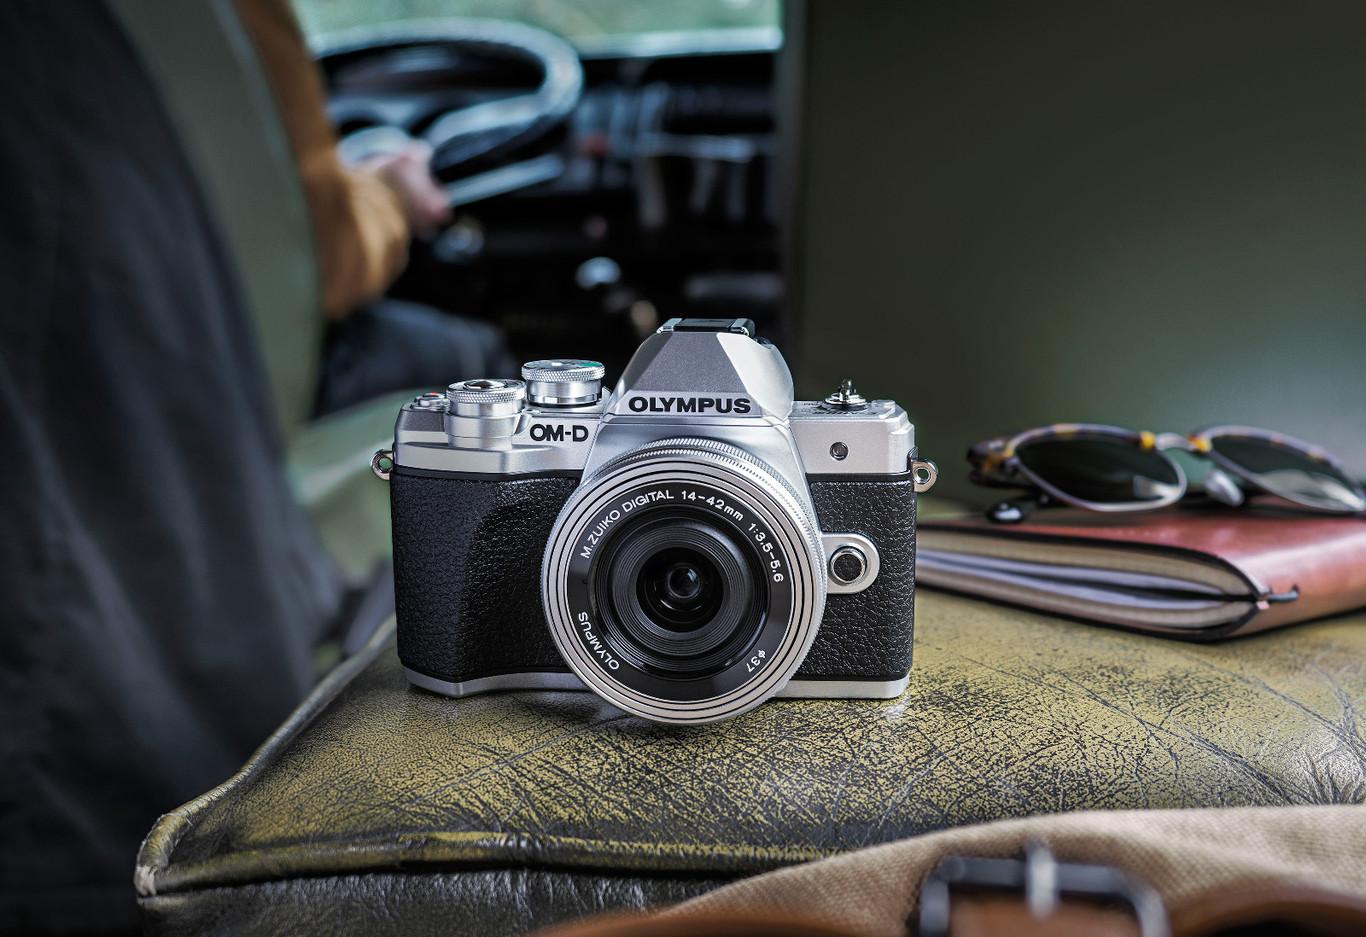 Olympus OMD E-M10 Mark II, Sony RX10, Panasonic Lumix LX15 y más cámaras, objetivos y accesorios en oferta: Llega Cazando Gangas